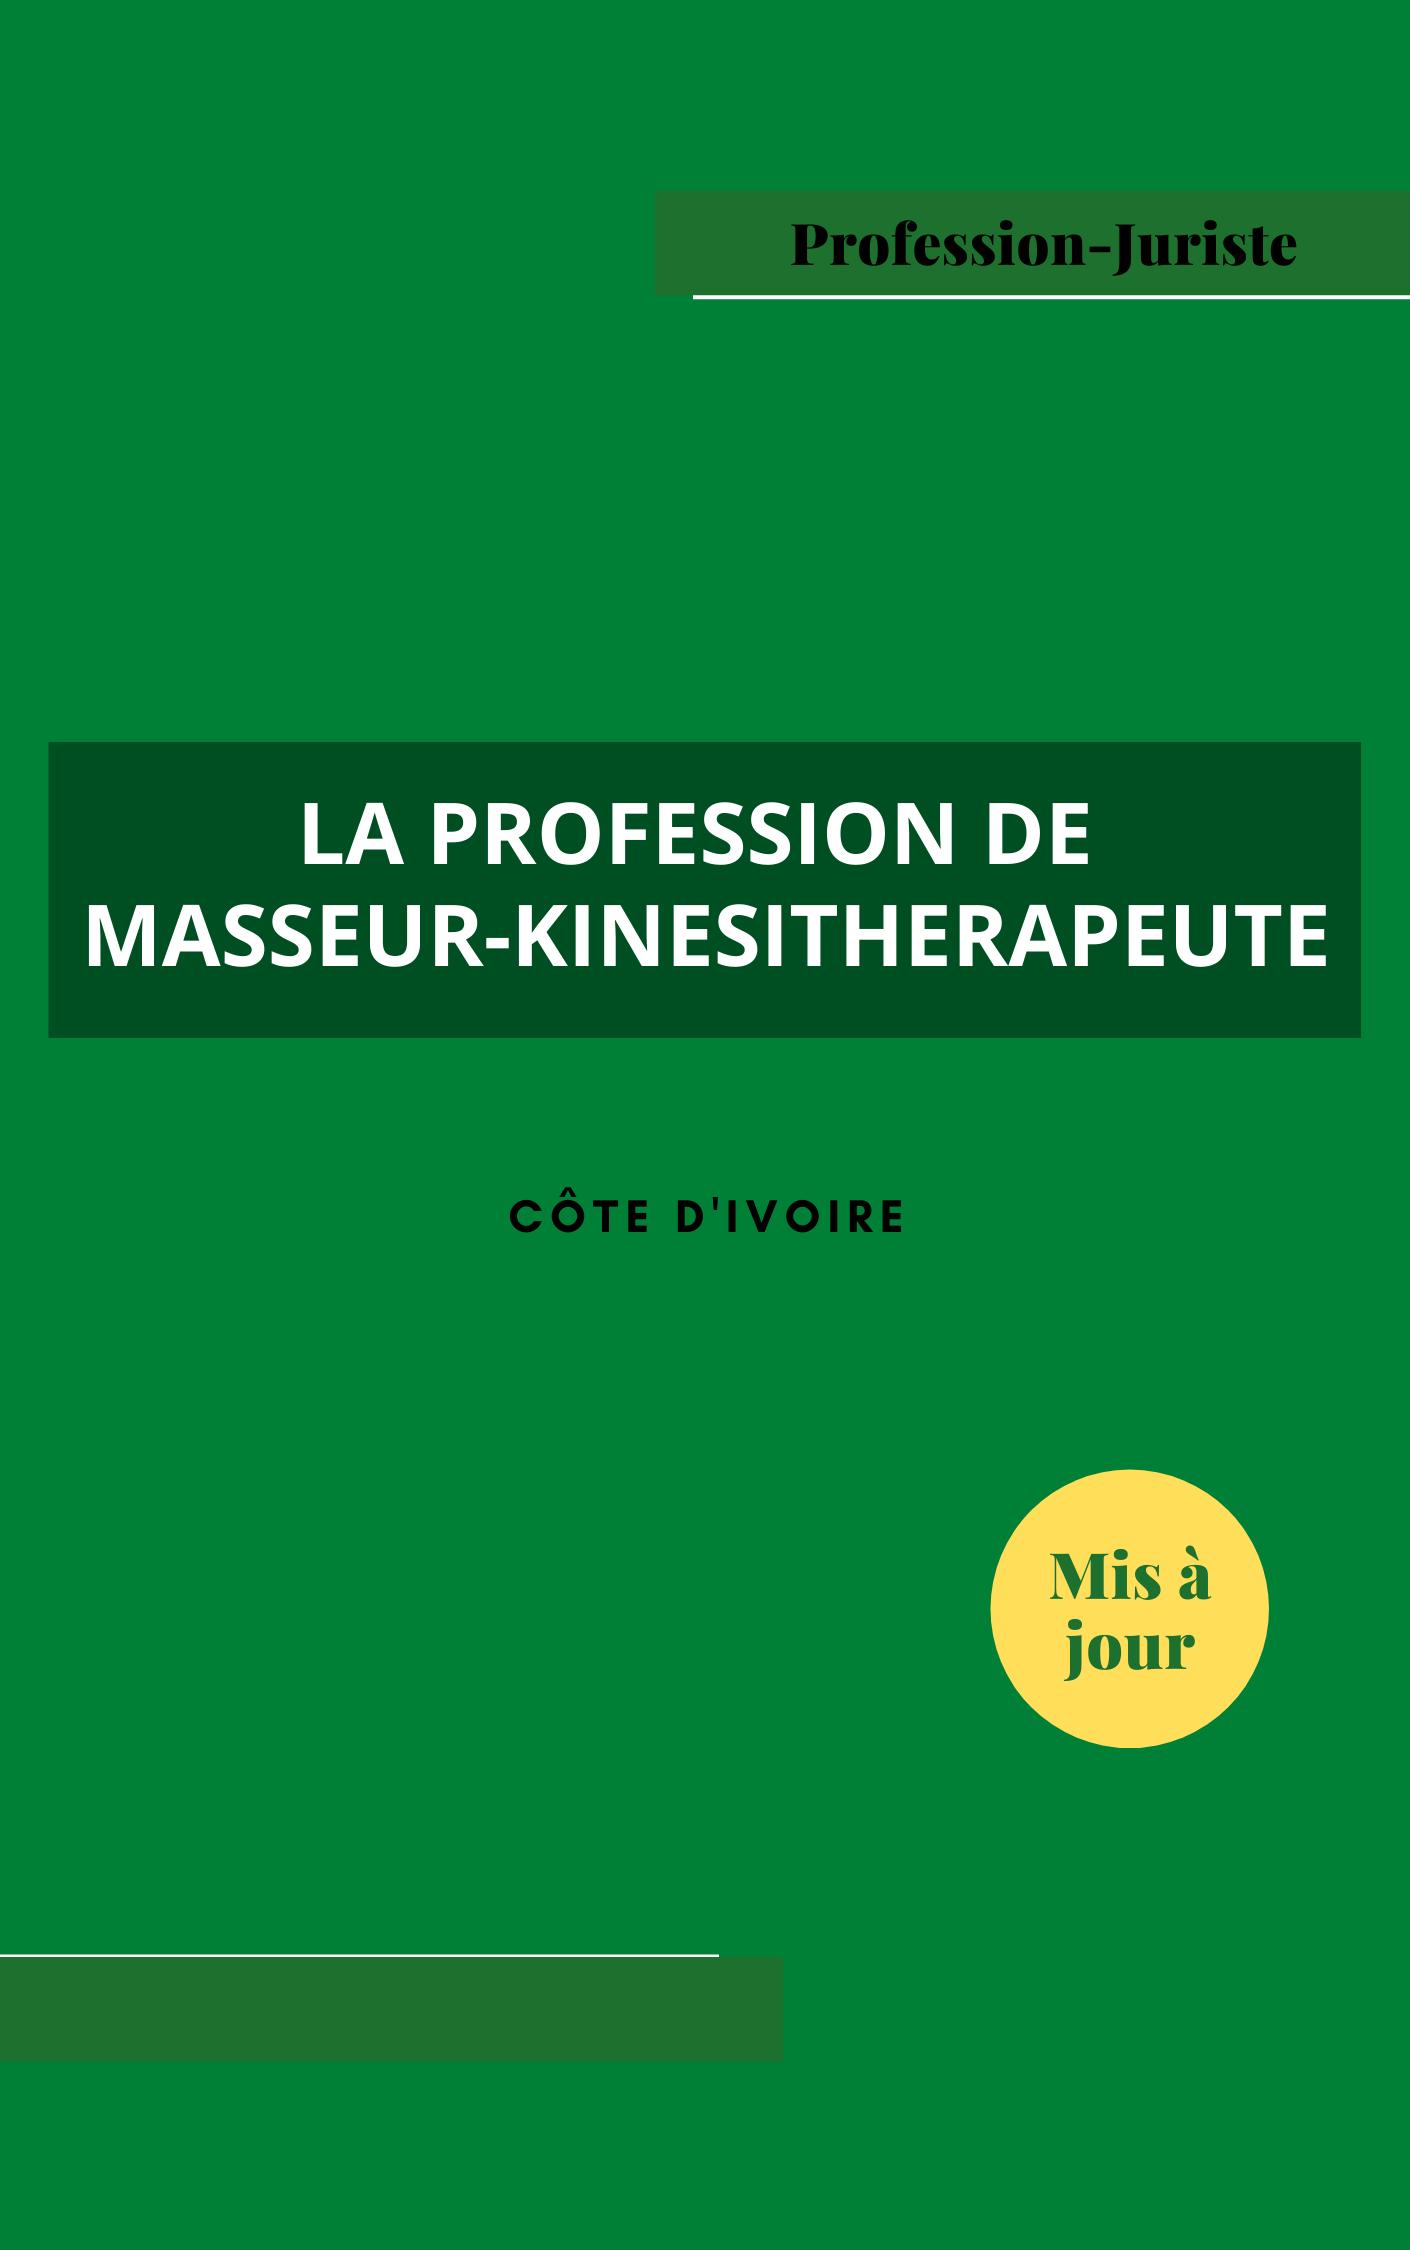 profession de masseur-kinesitherapeute